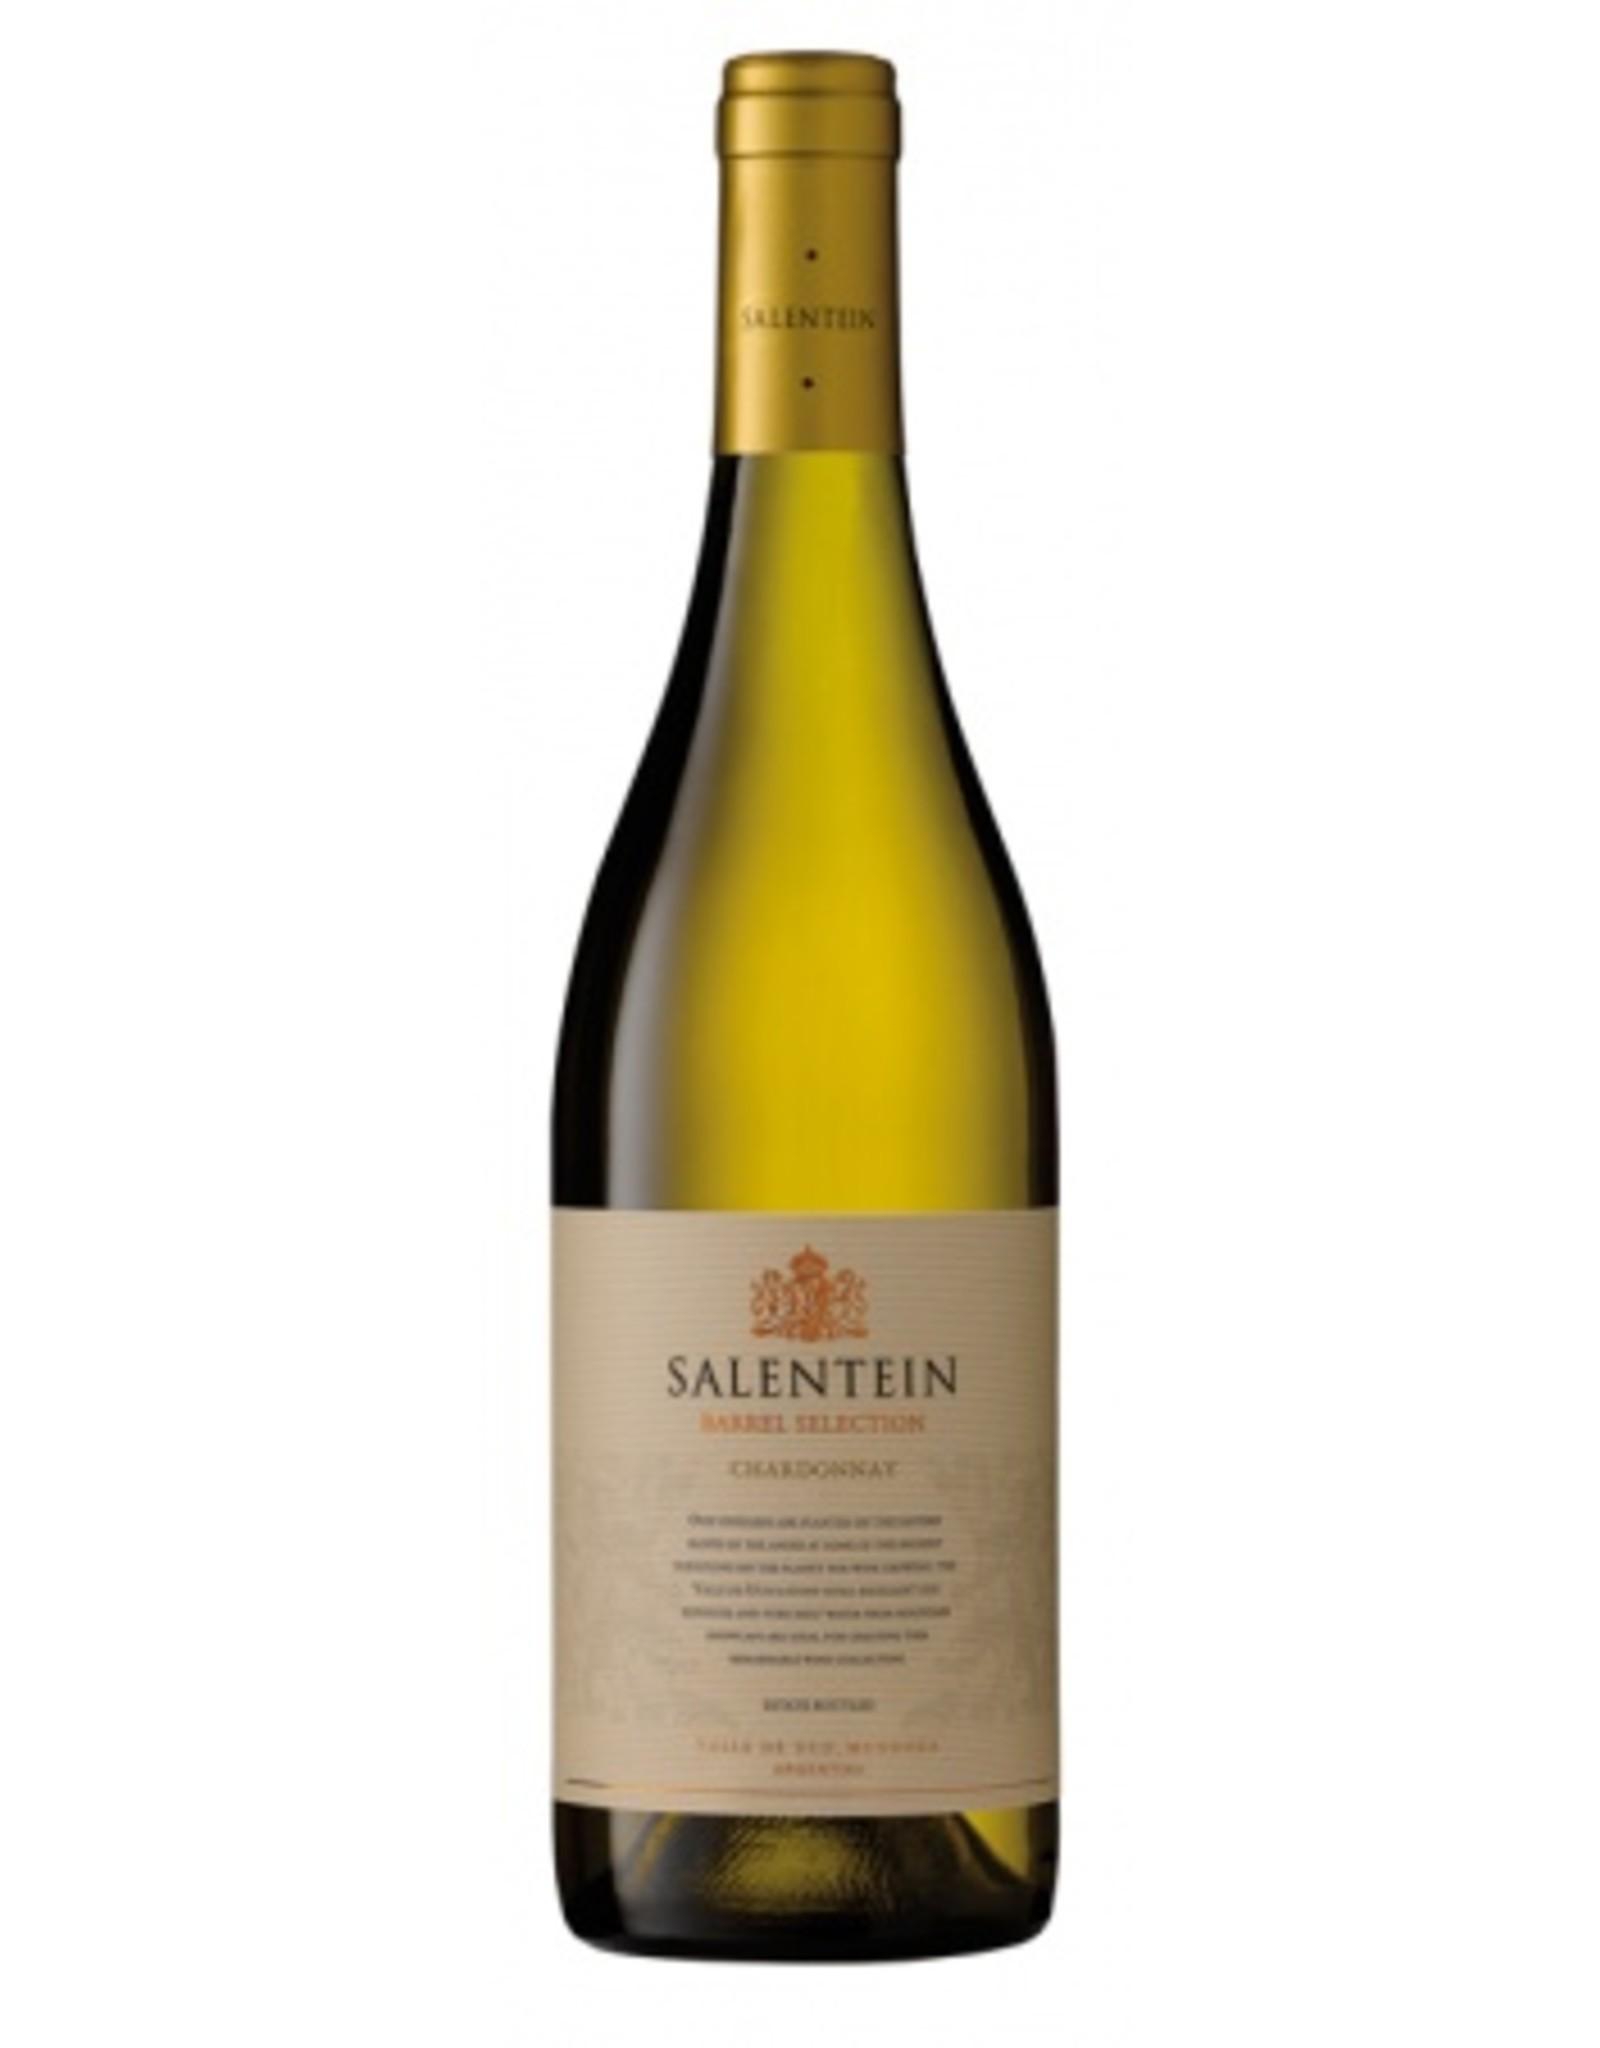 Proef Salentein Barrel Selection Chardonnay